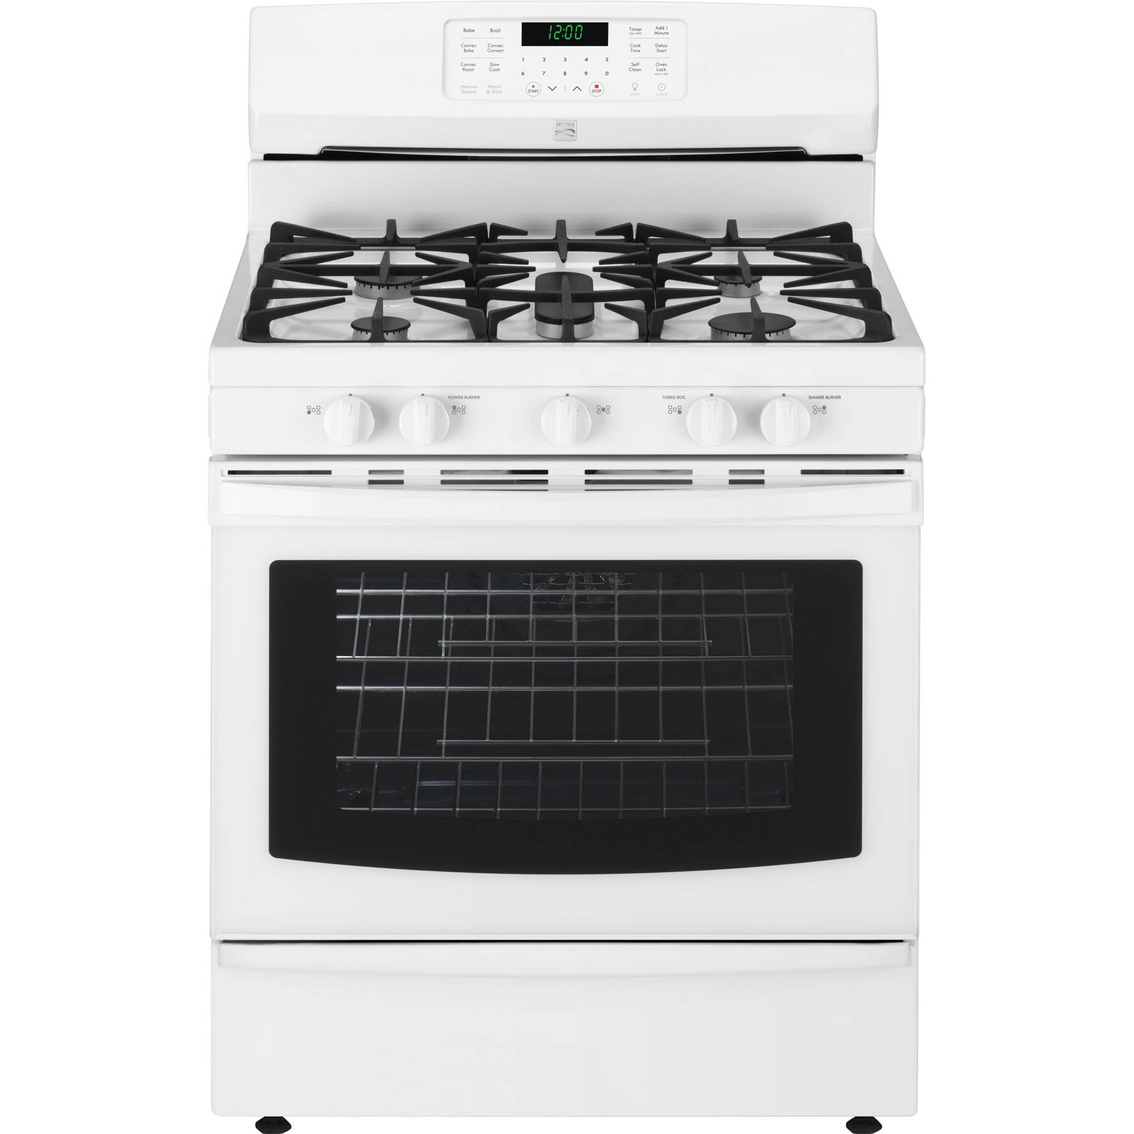 Gas Kitchen Appliances Kenmore 56 Cu Ft Gas Range With Convection Gas Ranges Home